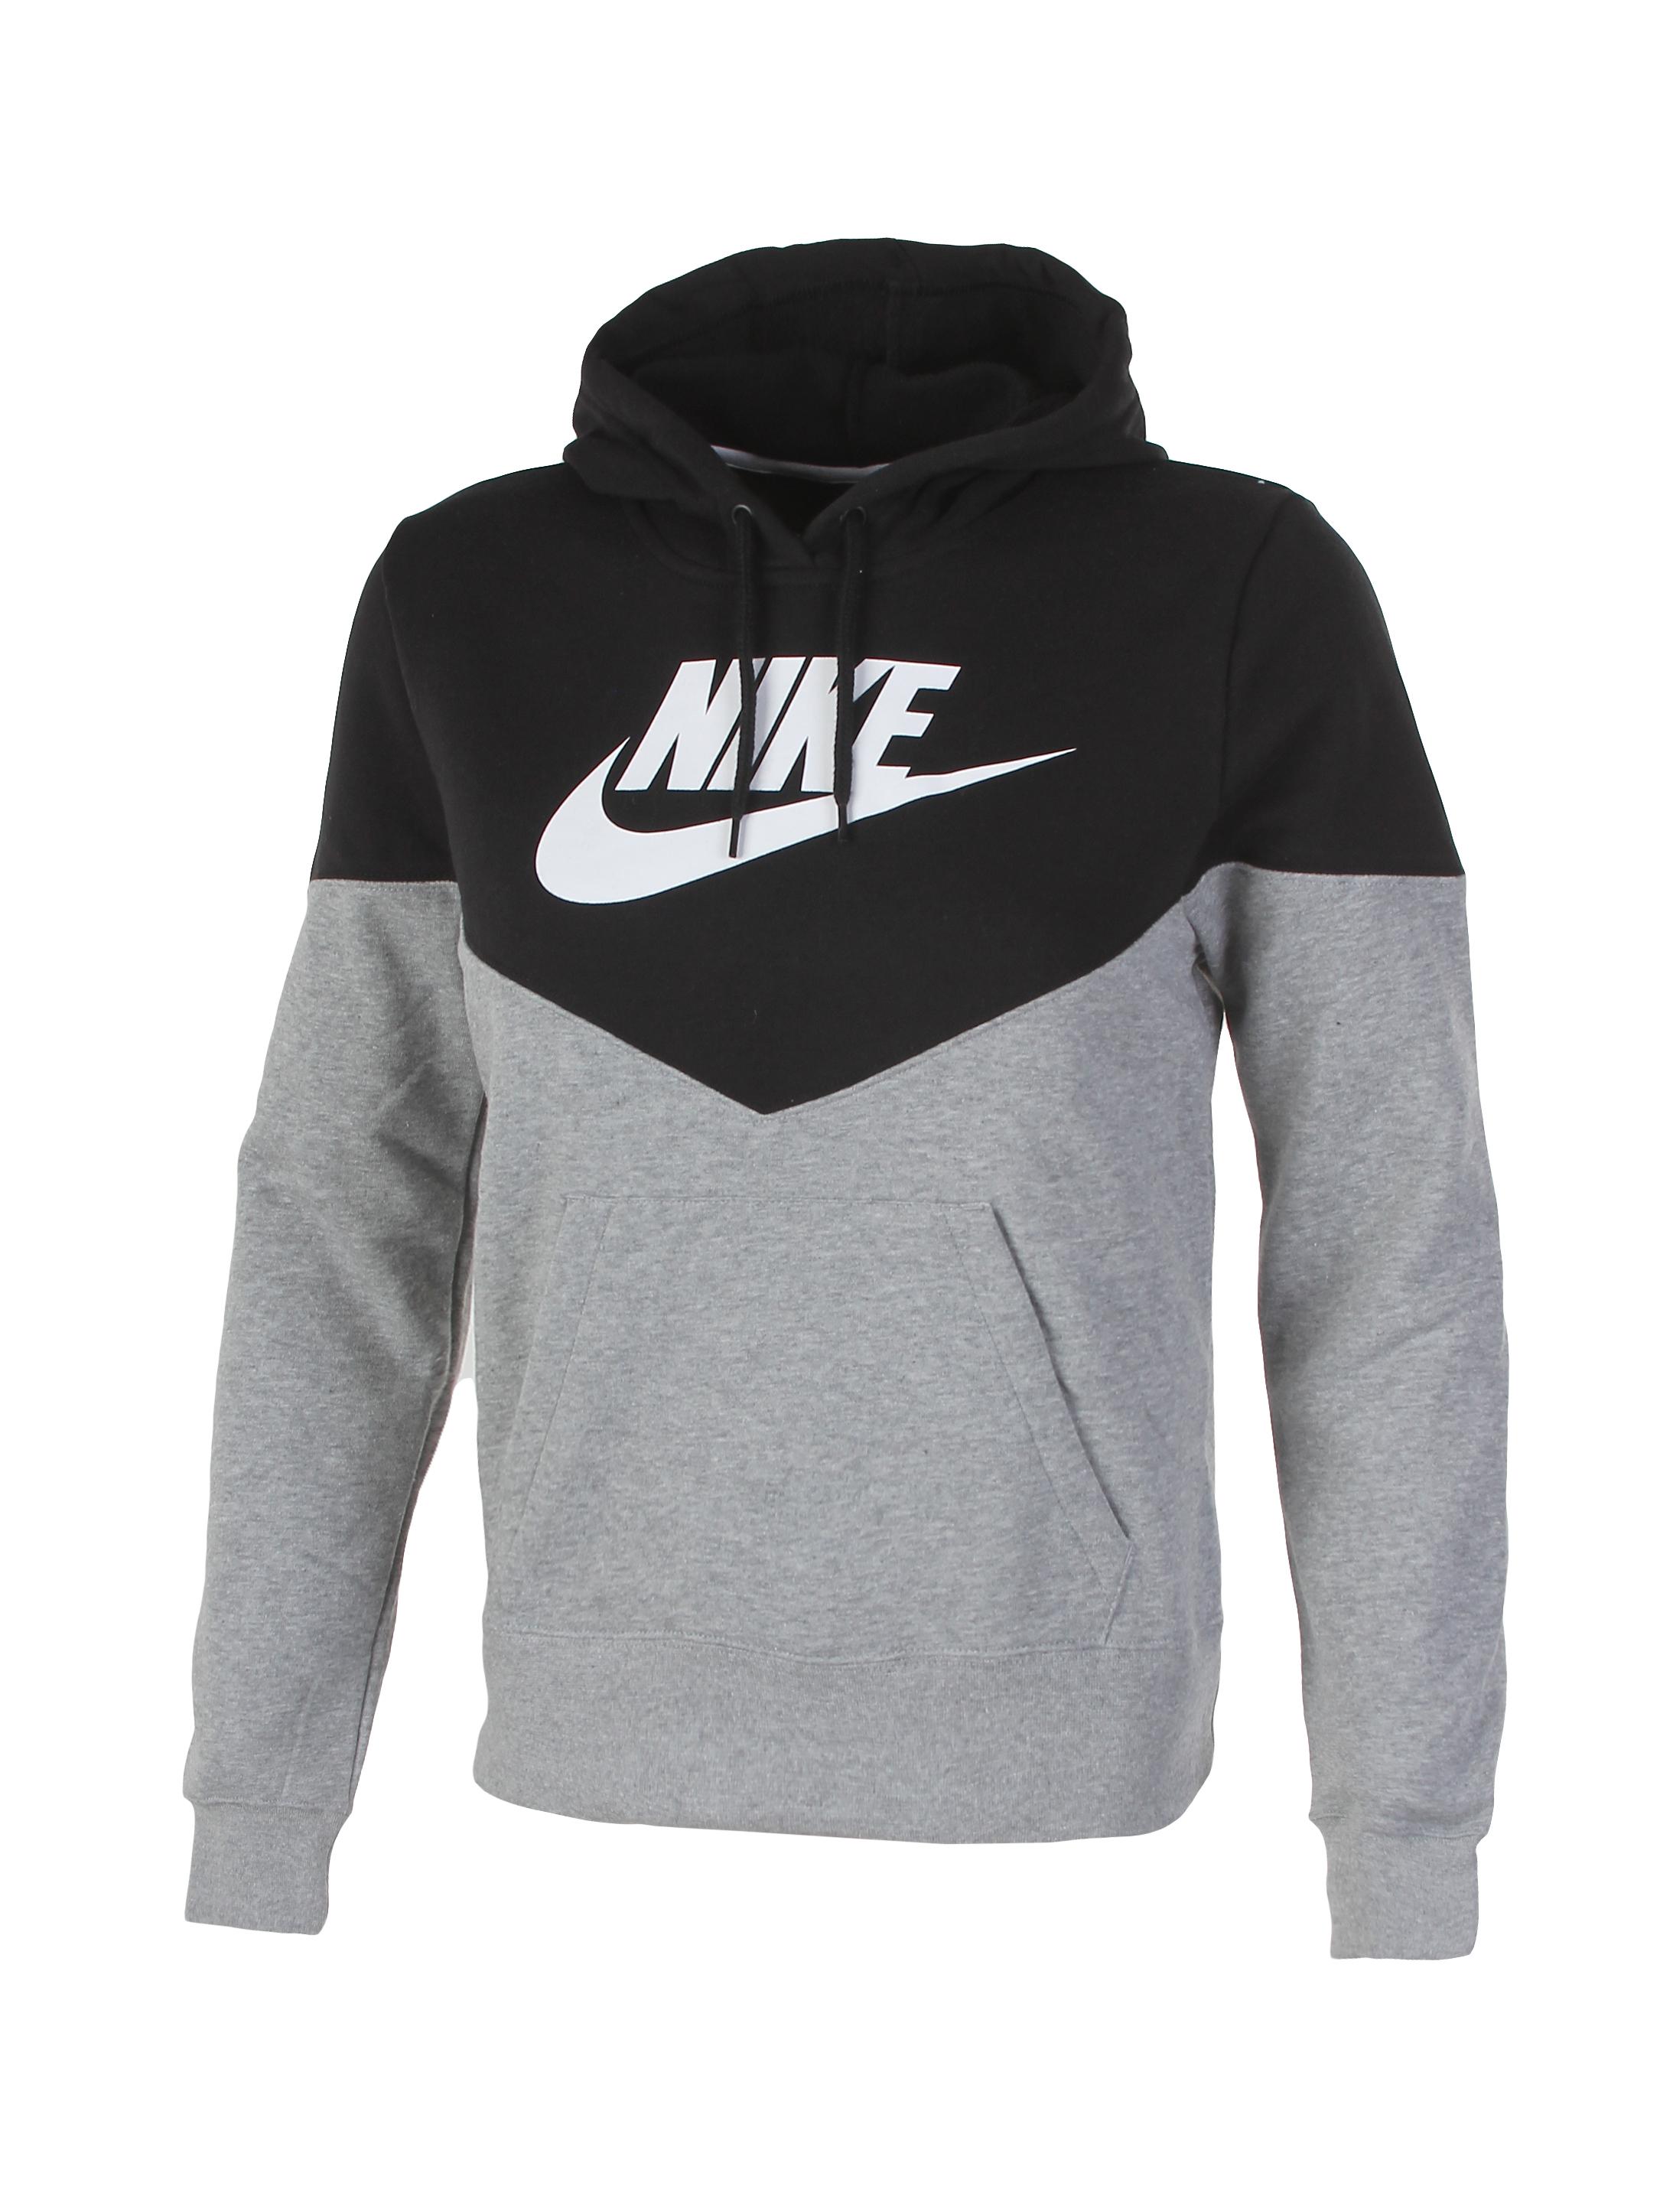 587a32cbbcb7 Толстовка женская Nike Sportswear